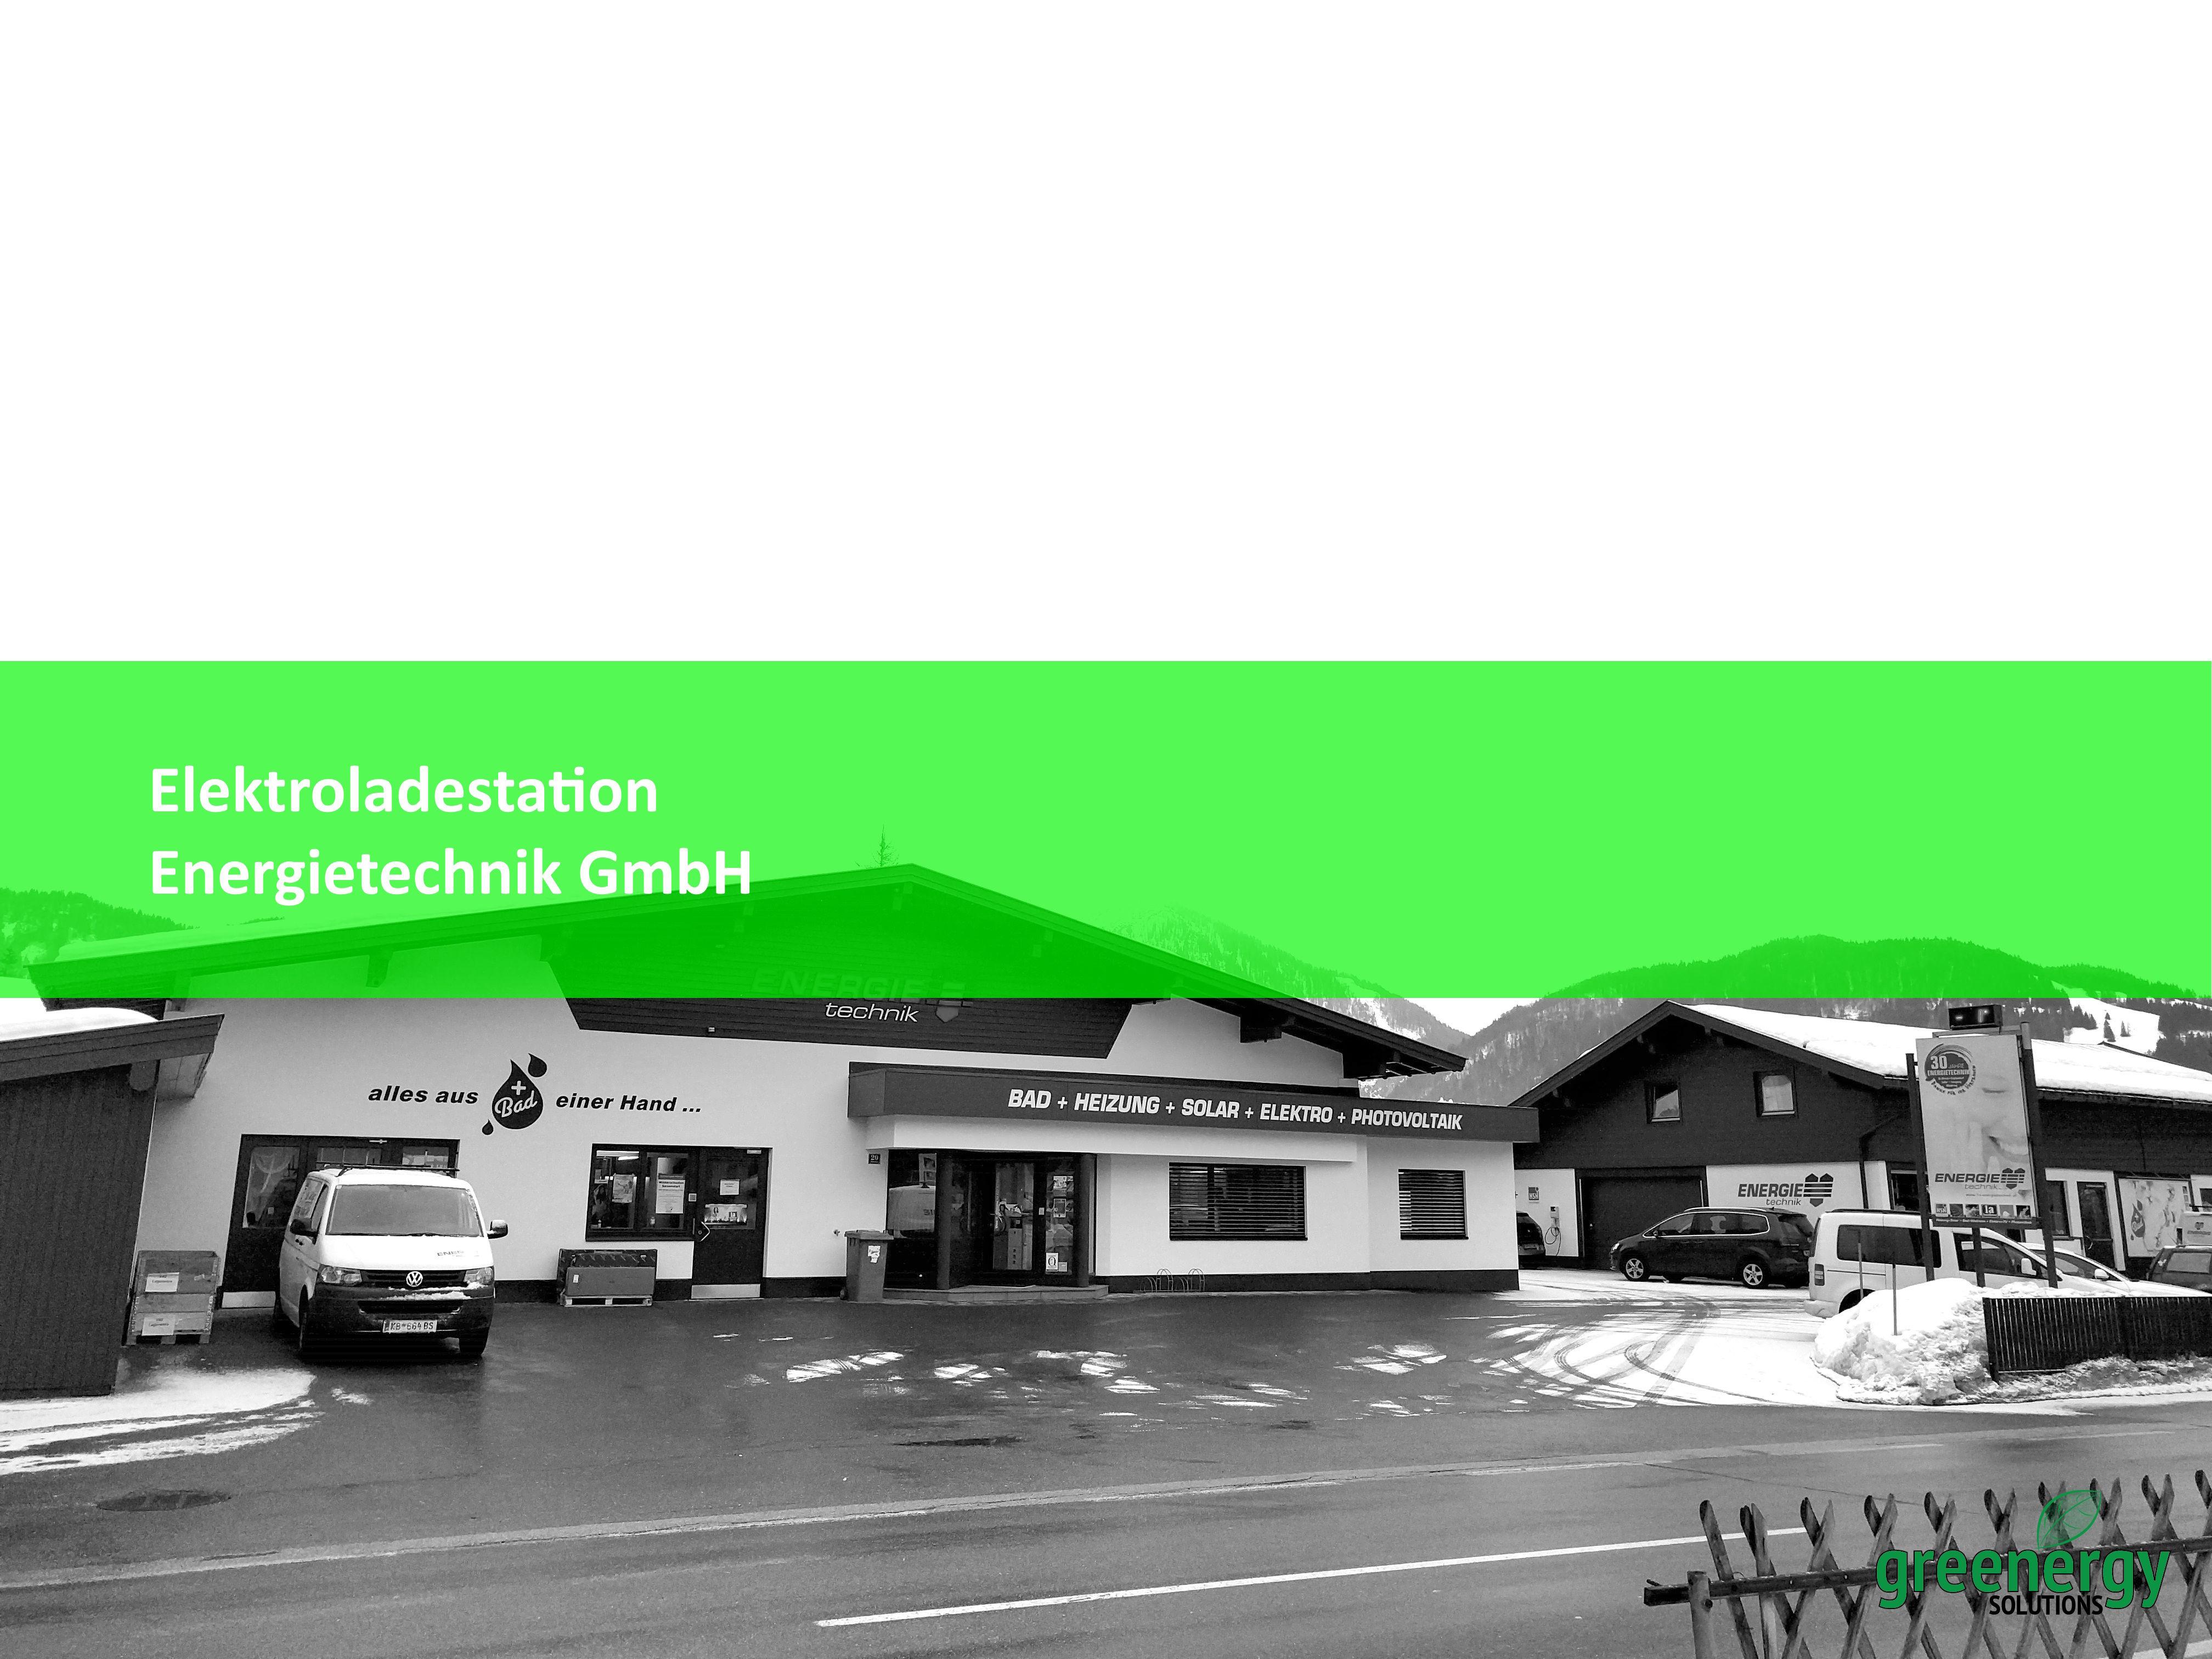 Ladesäule & Wallboxen Energietechnik GmbH